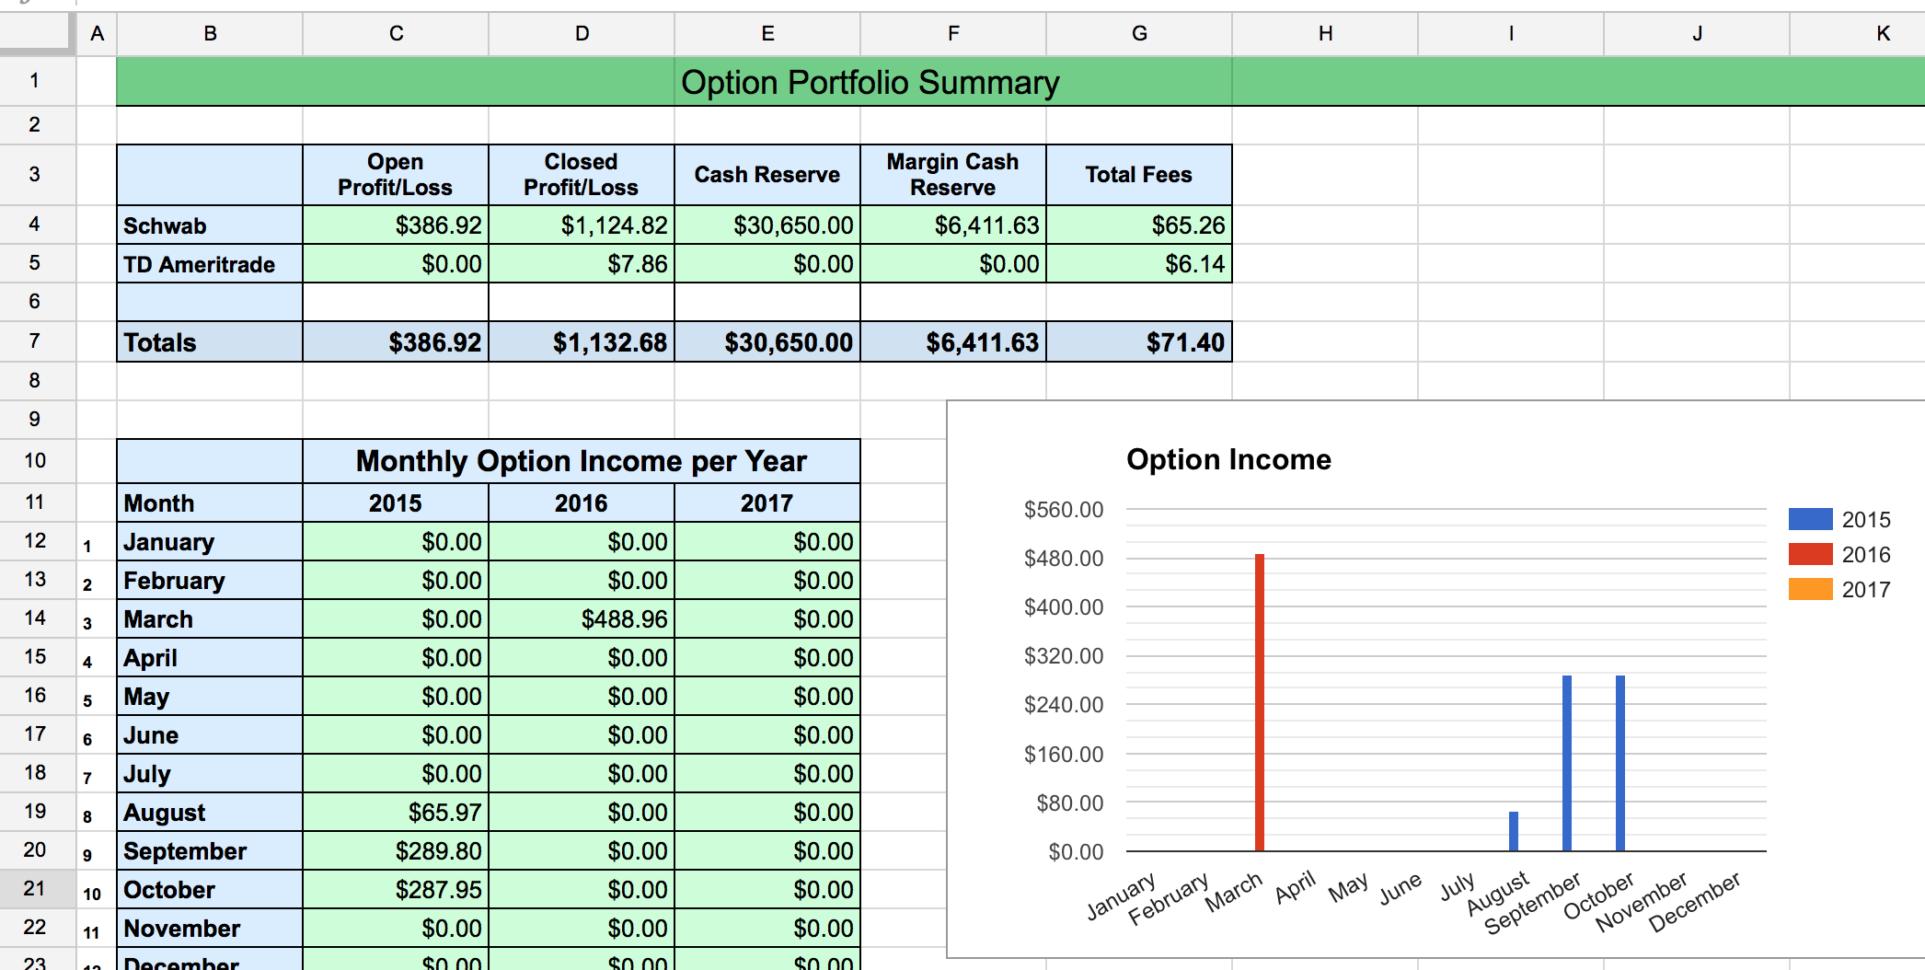 annualised hours spreadsheet  Annualised Hours Spreadsheet Inside Options Tracker Spreadsheet – Two Investing Annualised Hours Spreadsheet Printable Spreadshee